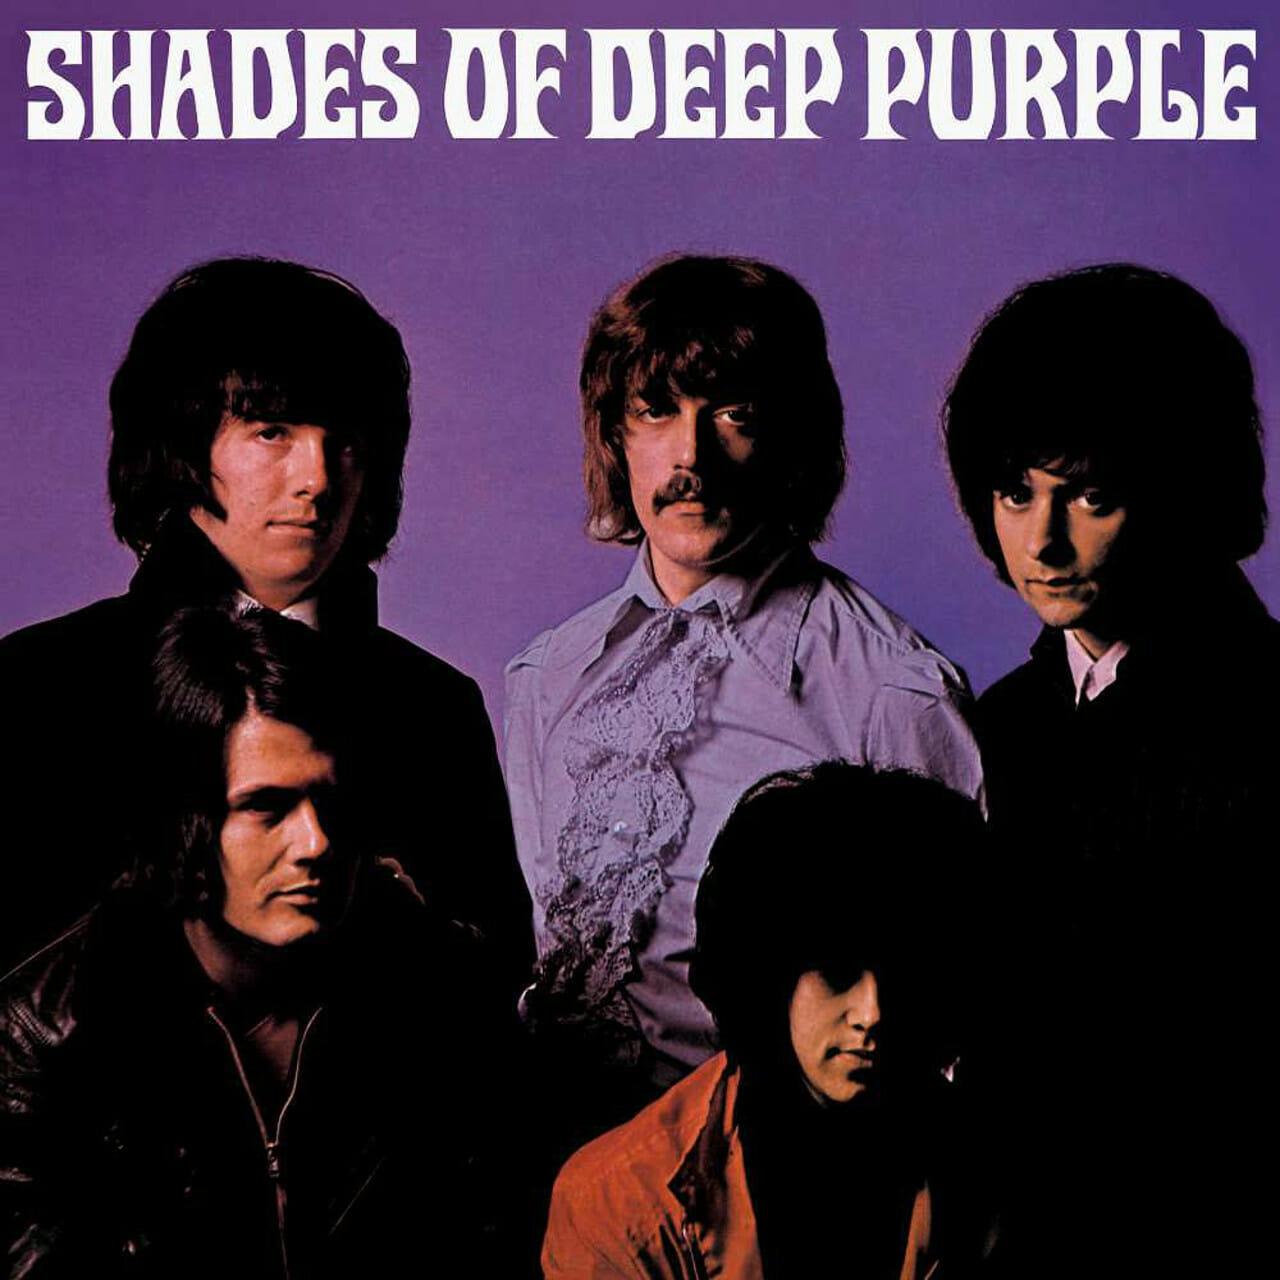 Ombres de púrpura profunda